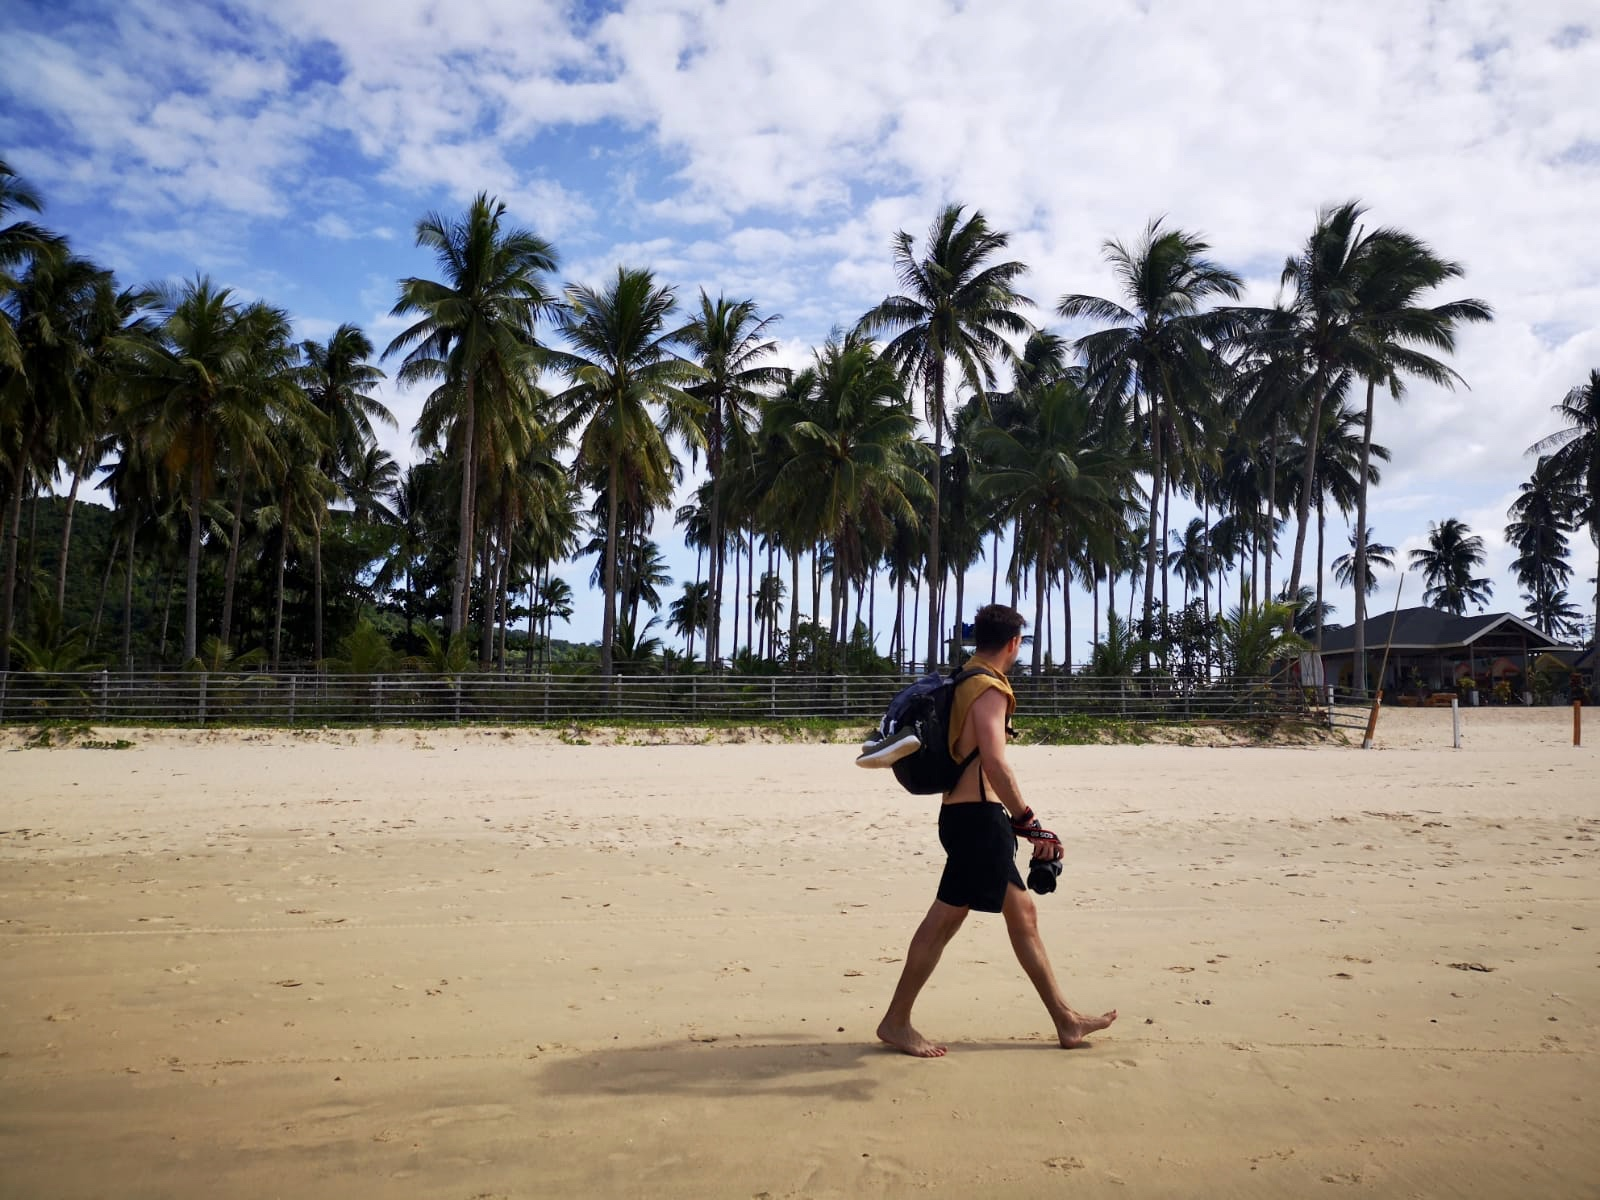 Philippines_redhead_round_the_world_travel_blogger_10.jpg